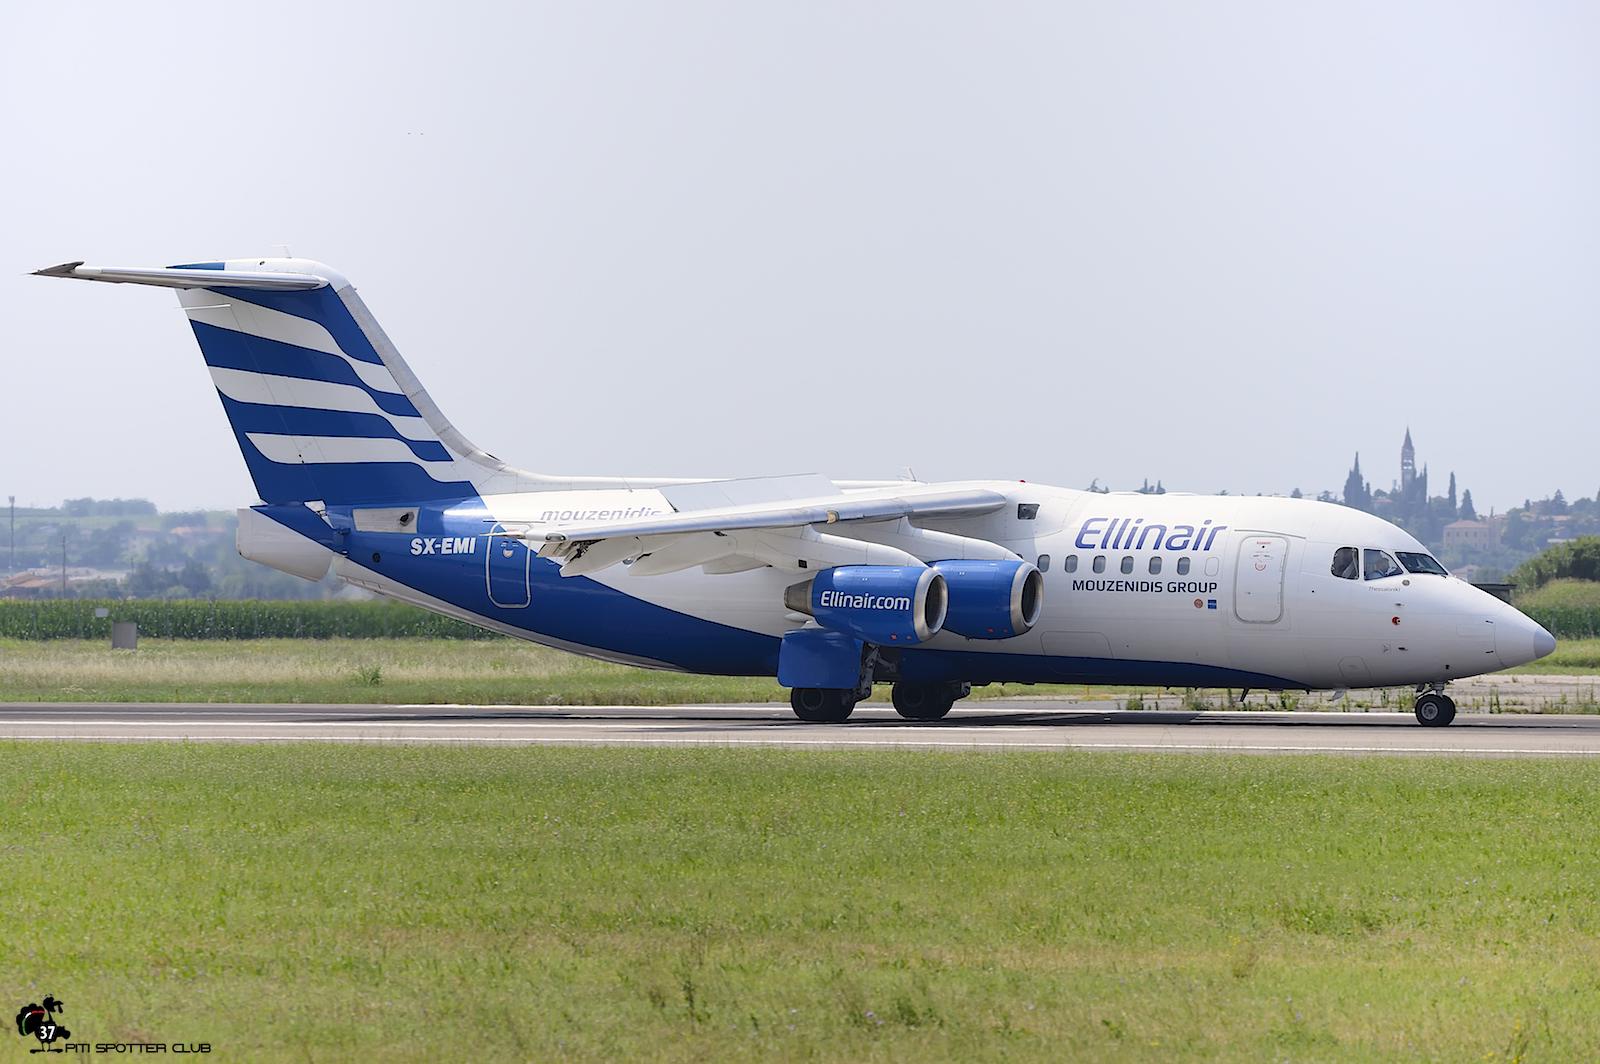 SX-EMI BAe146-RJ85 E2305 Ellinair